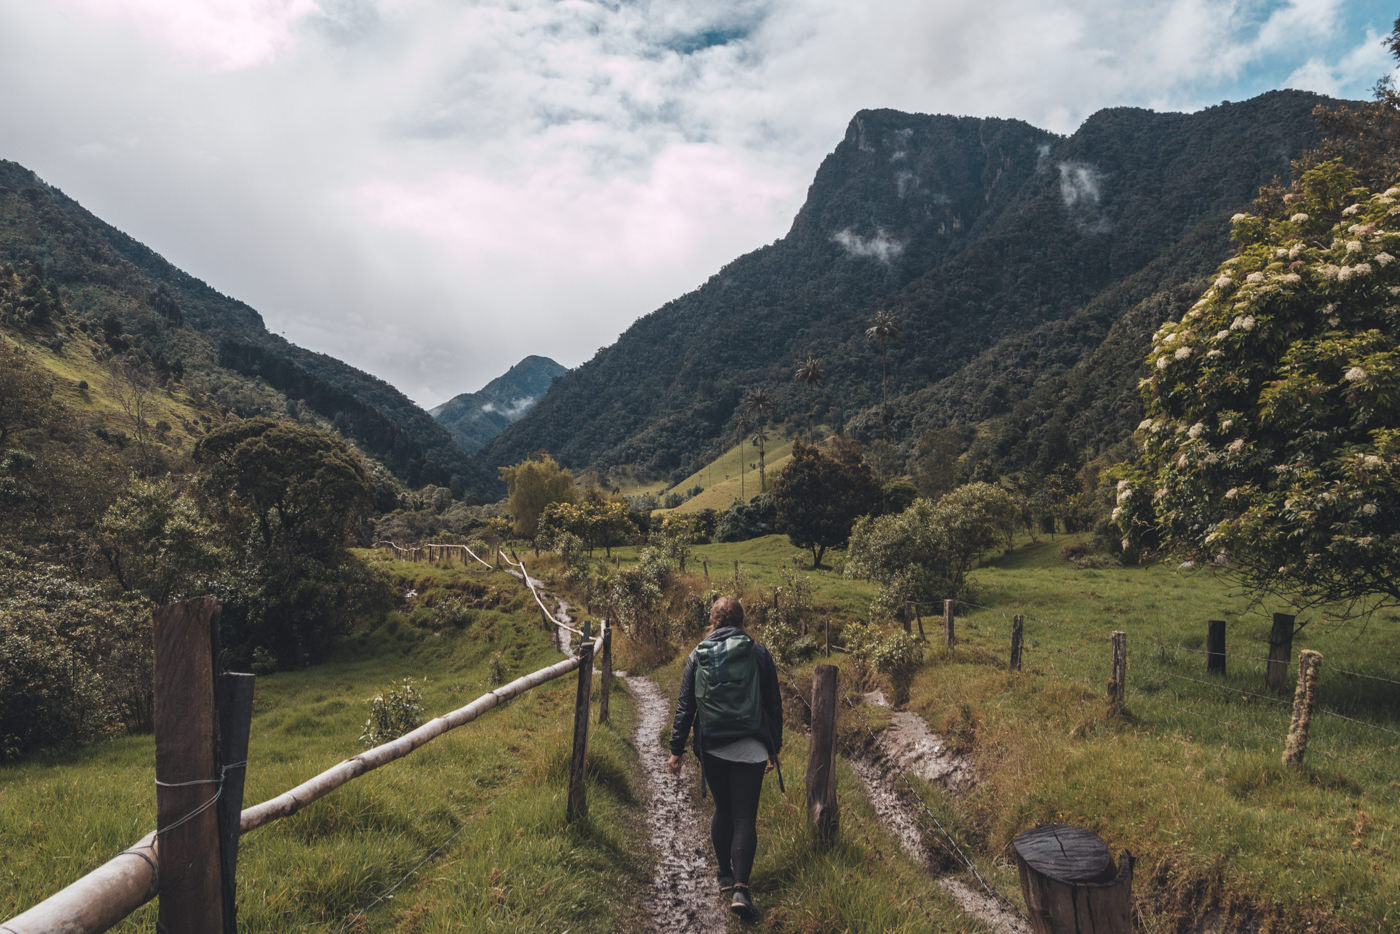 Wanderung durch das Valle de Cocora, Salento, Kolumbien